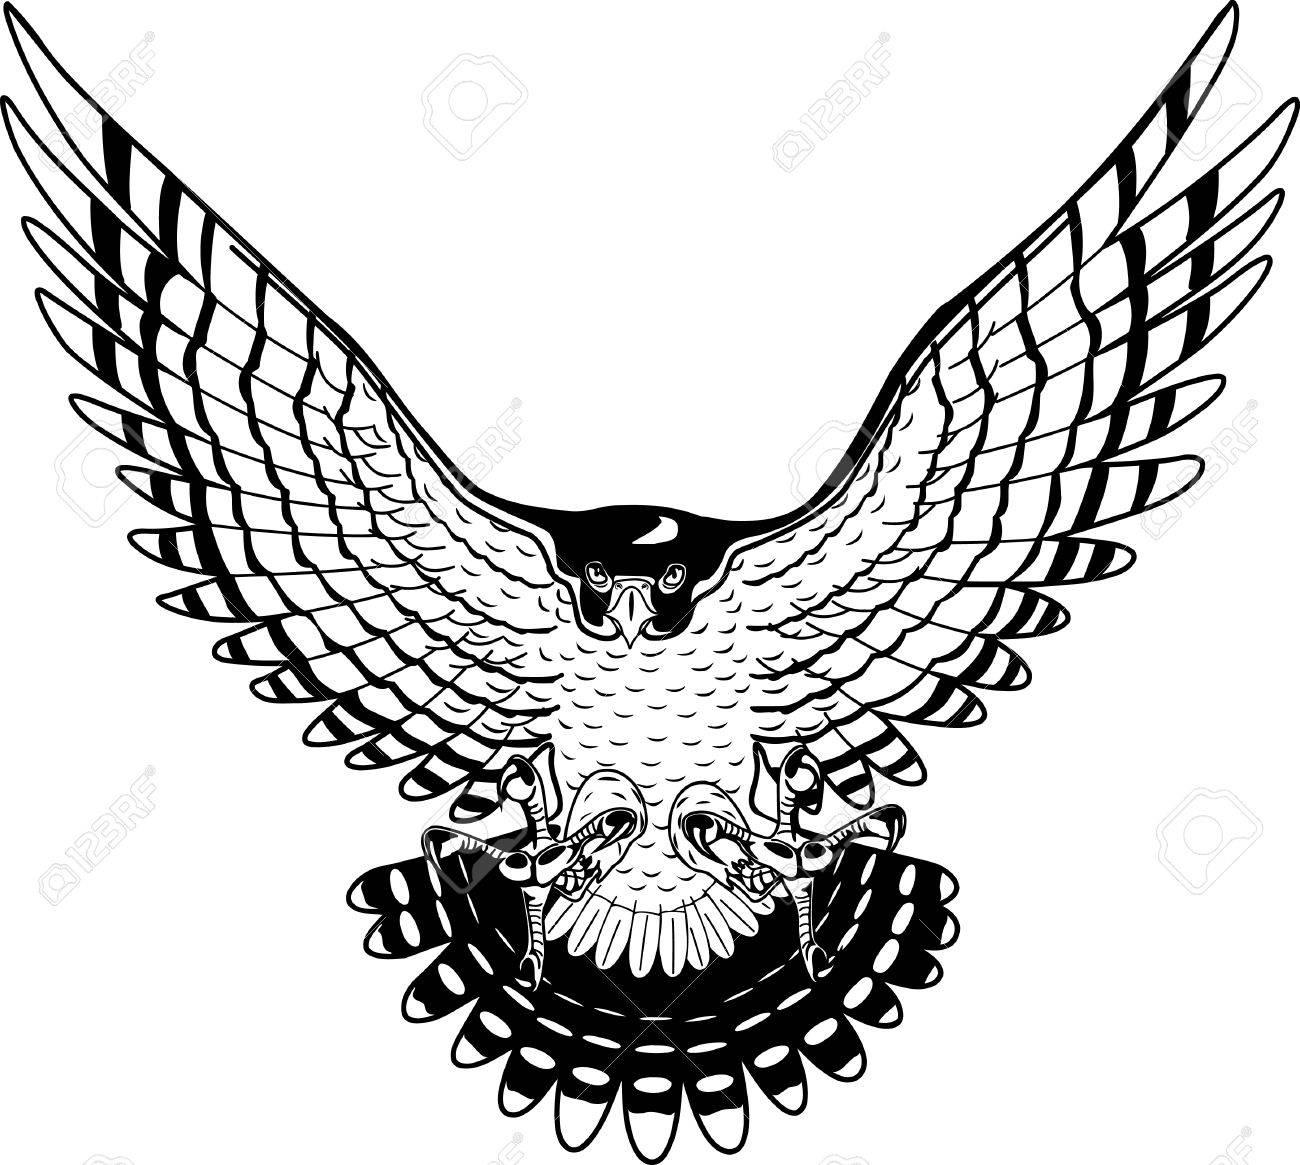 1300x1165 Peregrine Falcon Illustration. Royalty Free Cliparts, Vectors,